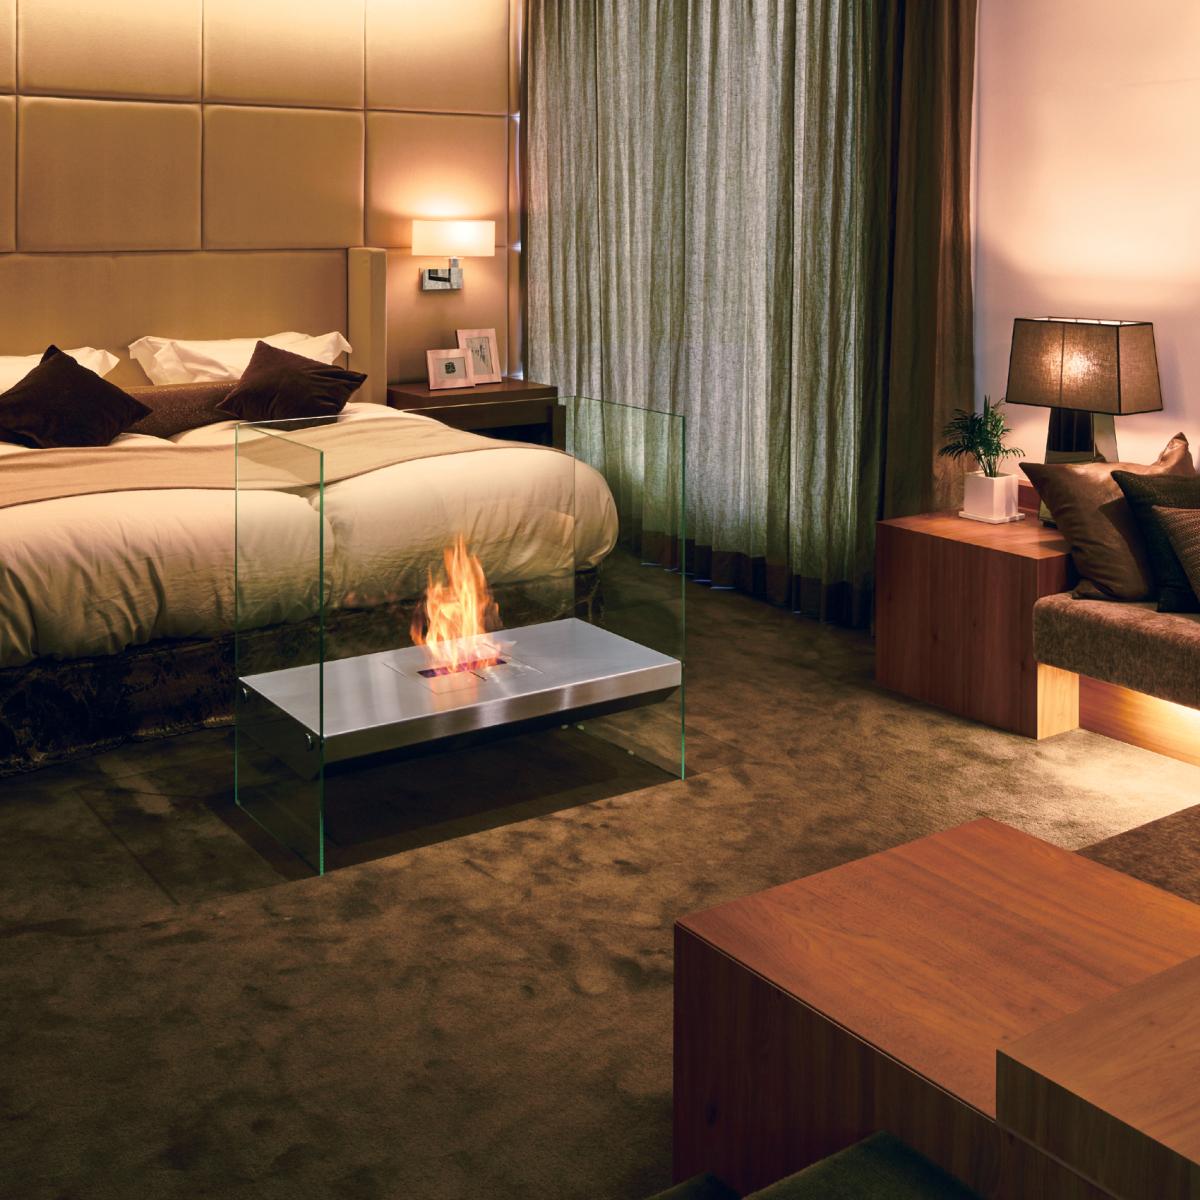 EcoSmart Fire Igloo designer fireplace